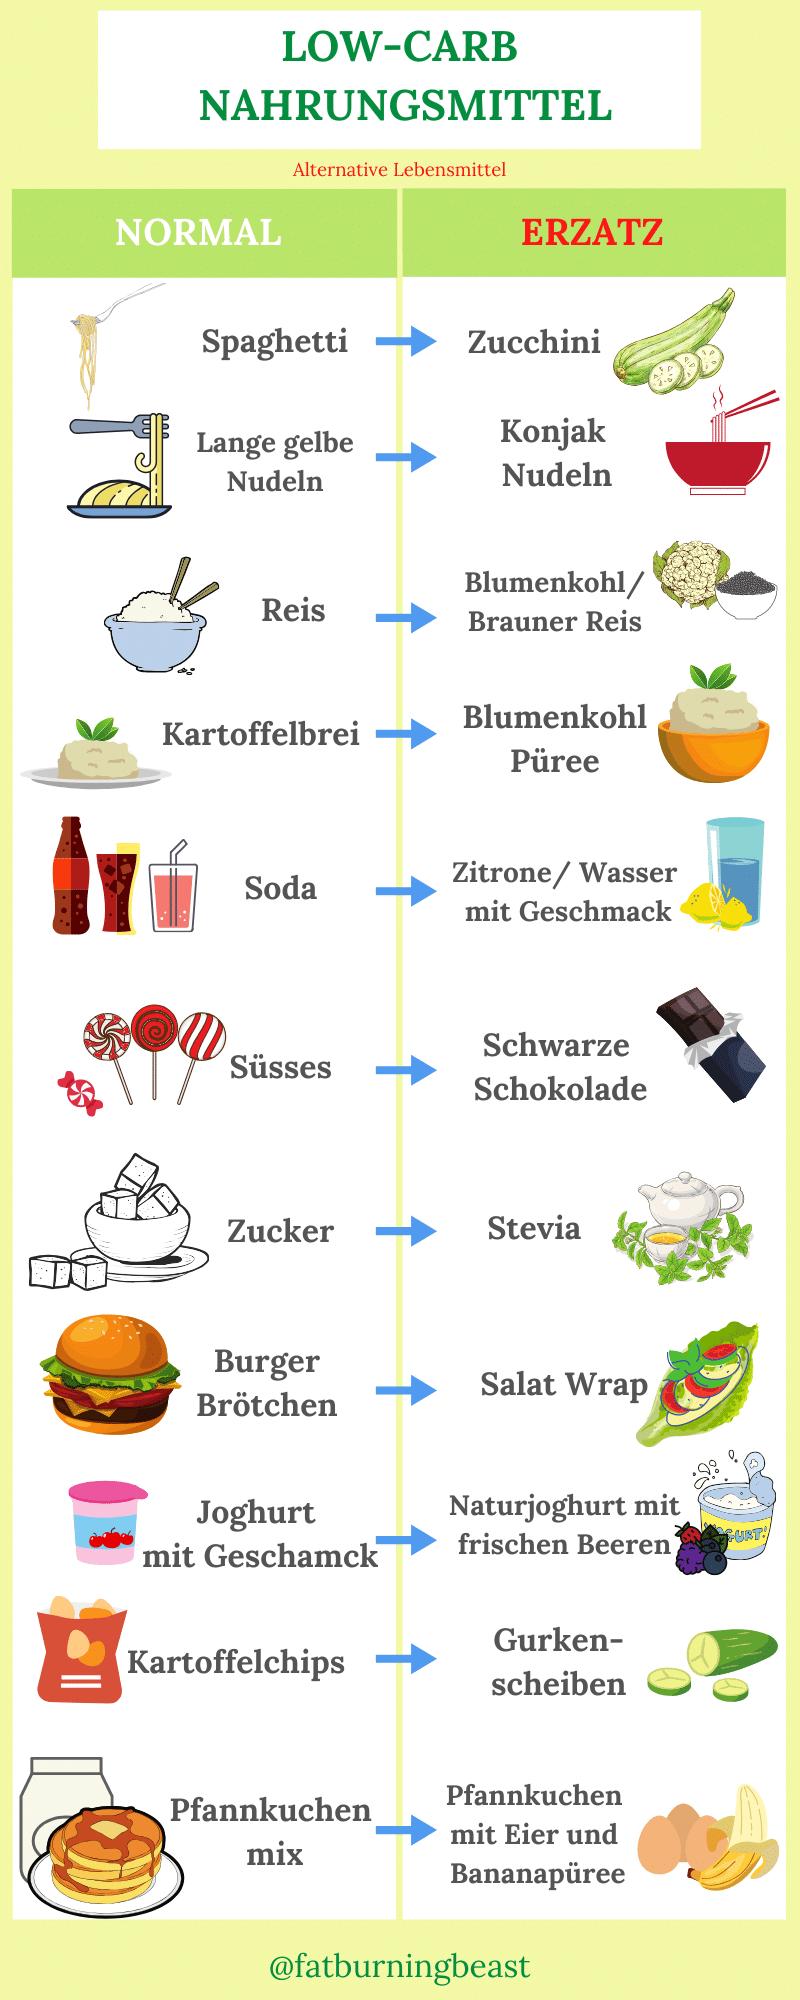 Low-Carb-Nahrungsmittel